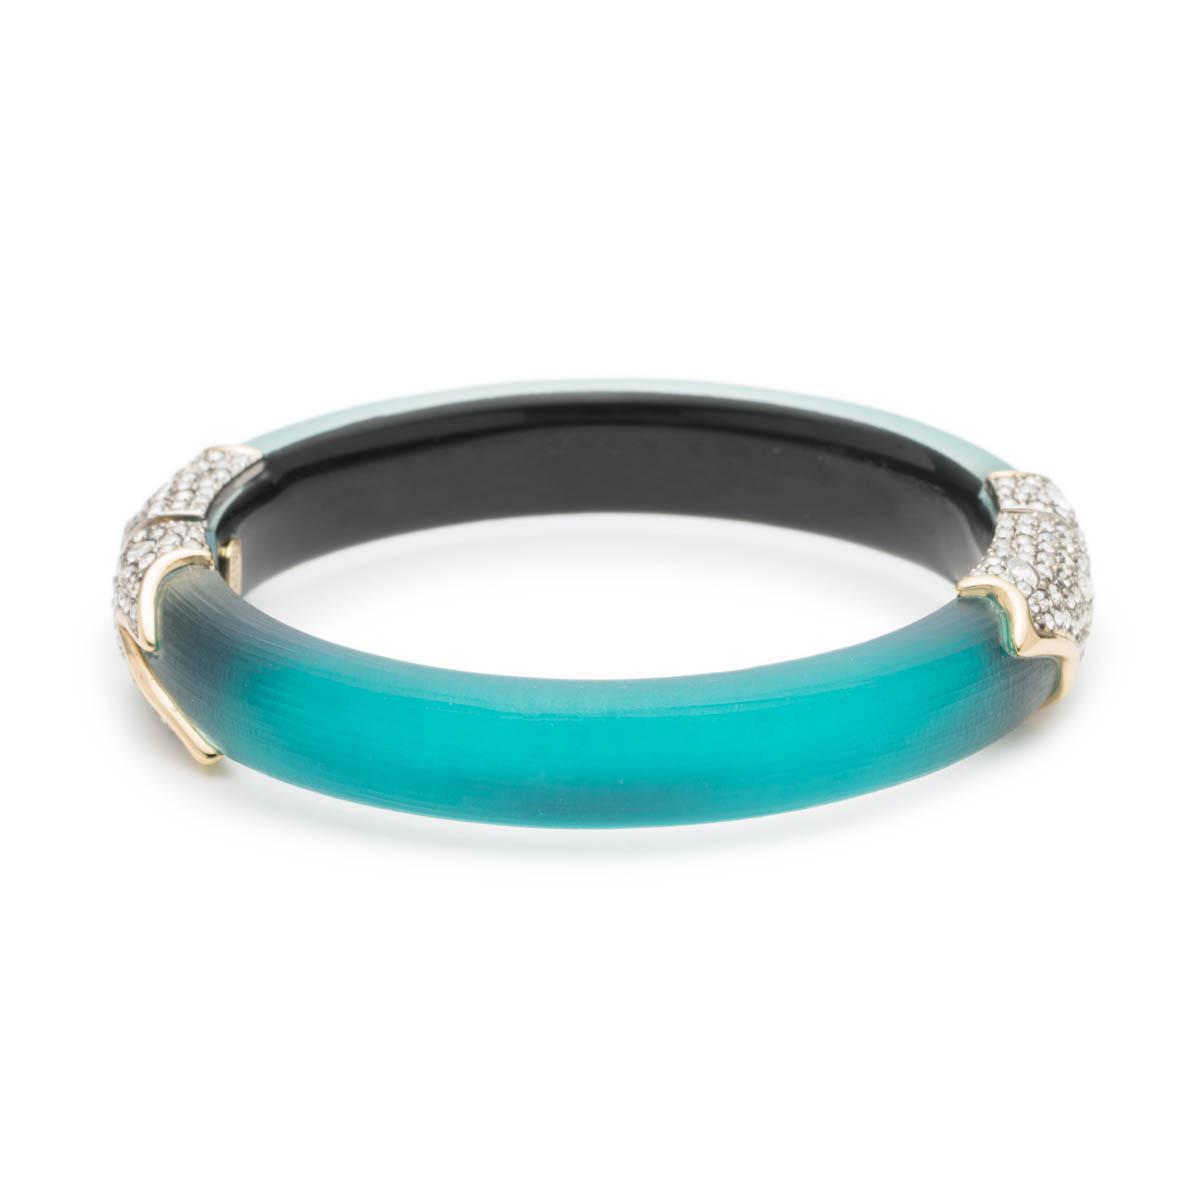 Alexis Bittar Crystal Encrusted Feather Hinge Bracelet, Lake Blue